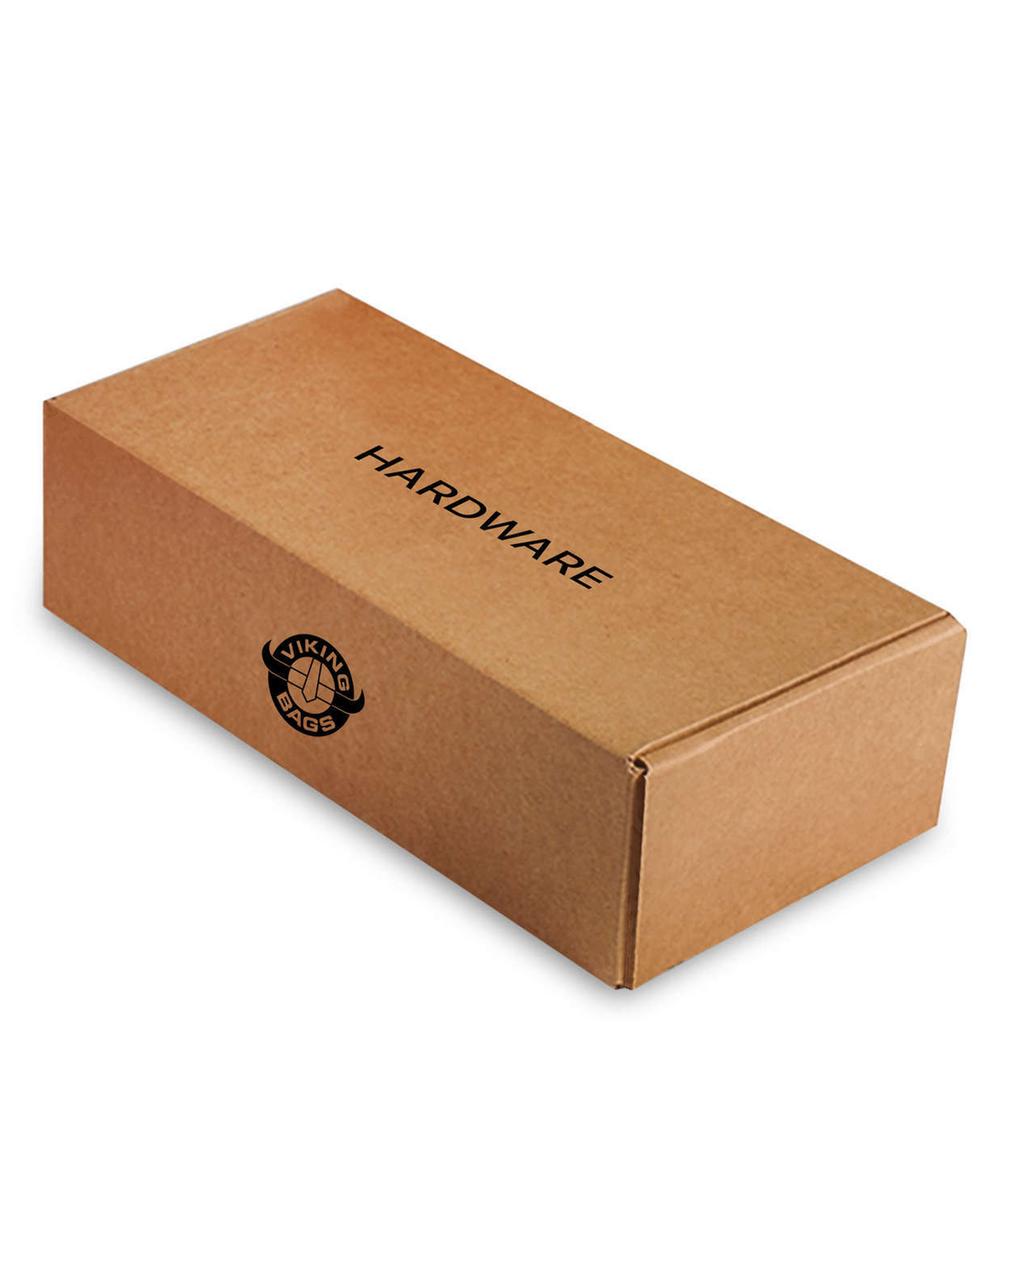 Triumph Thunderbird Viking Raven Medium Leather Motorcycle Saddlebags Box